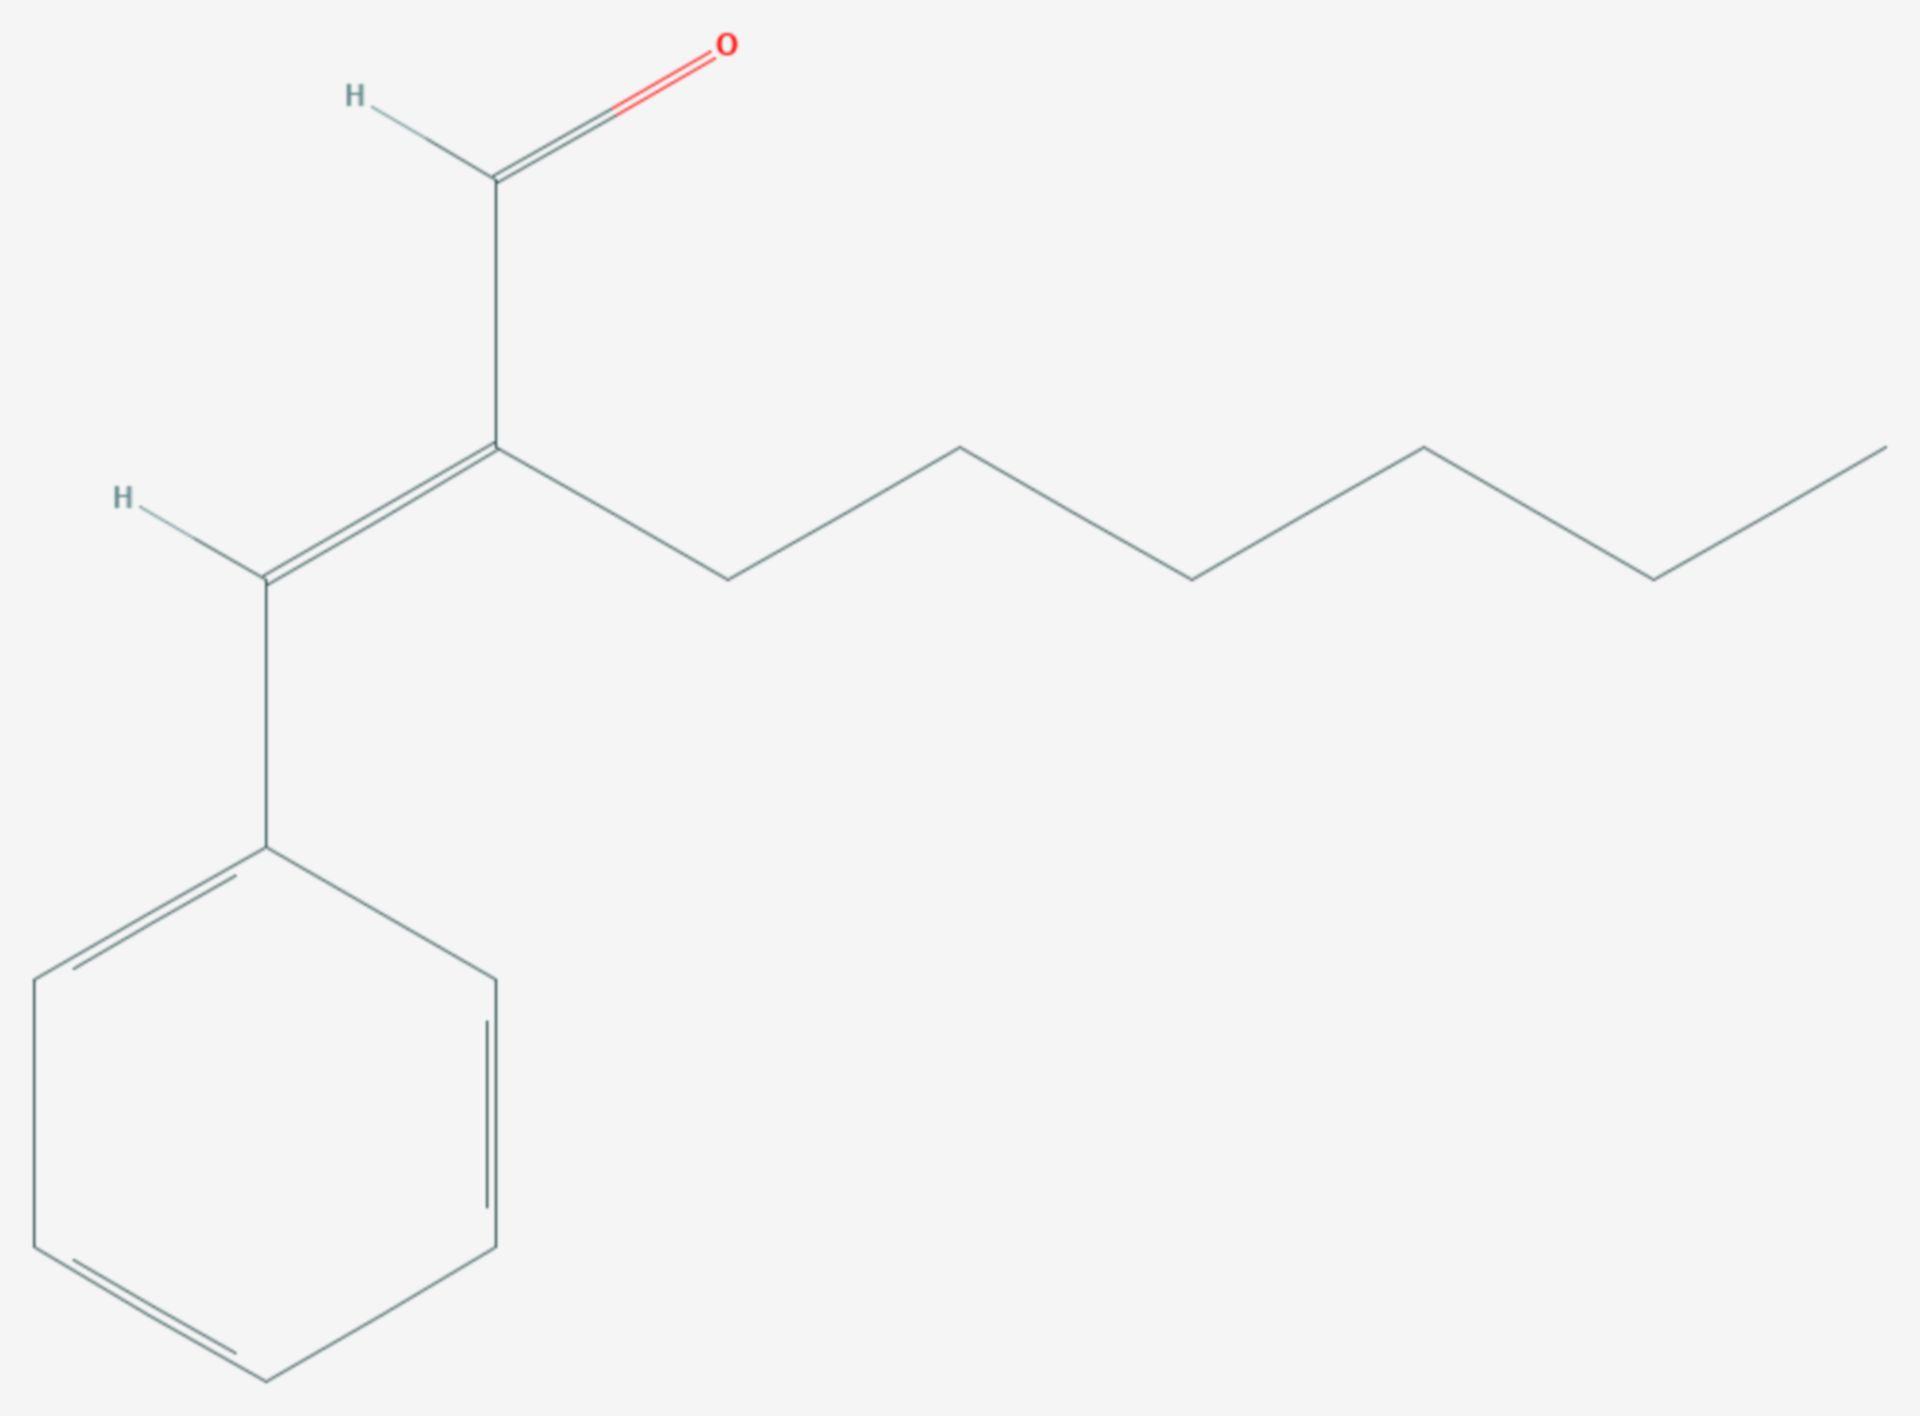 Hexylzimtaldehyd (Strukturformel)